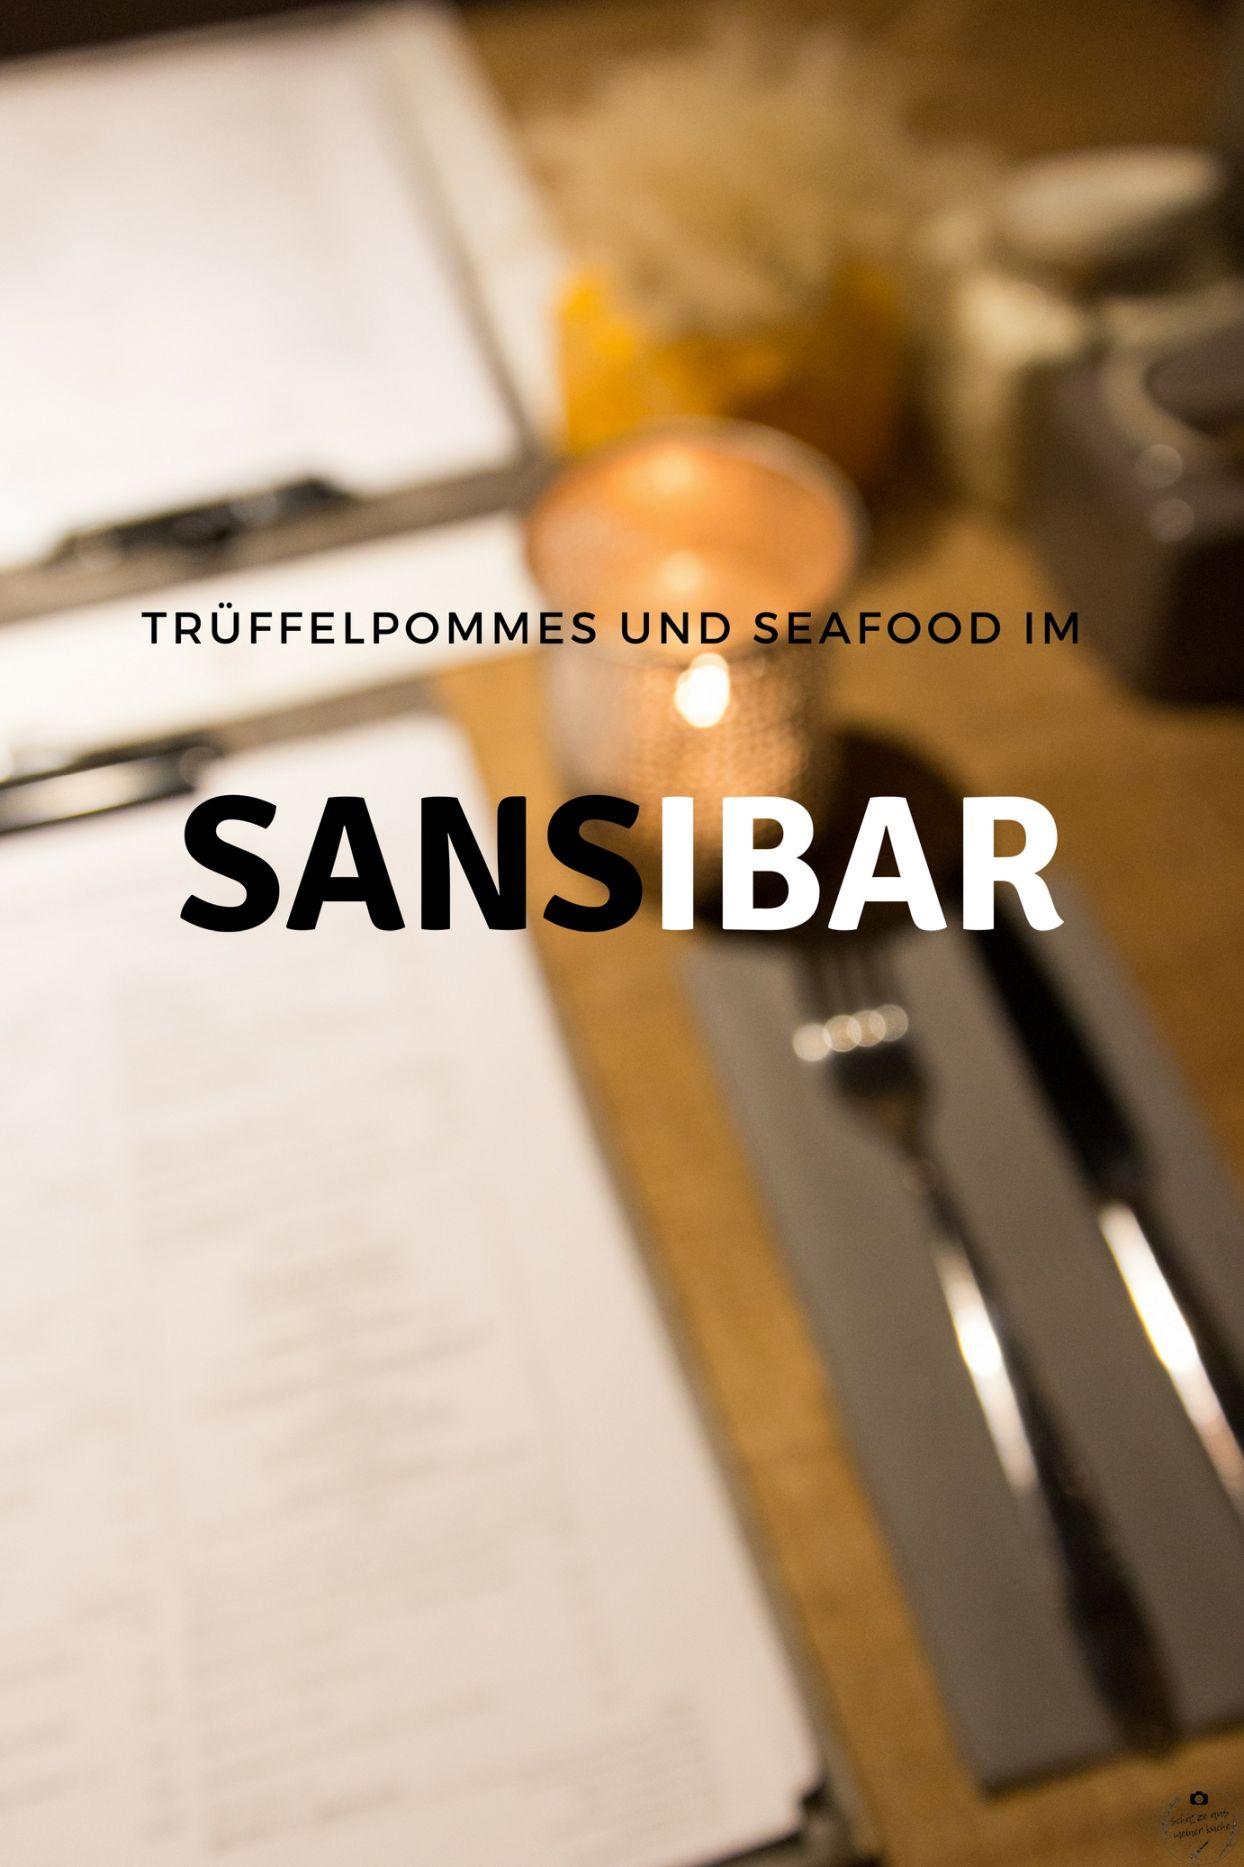 Sansibar in Stuttgart